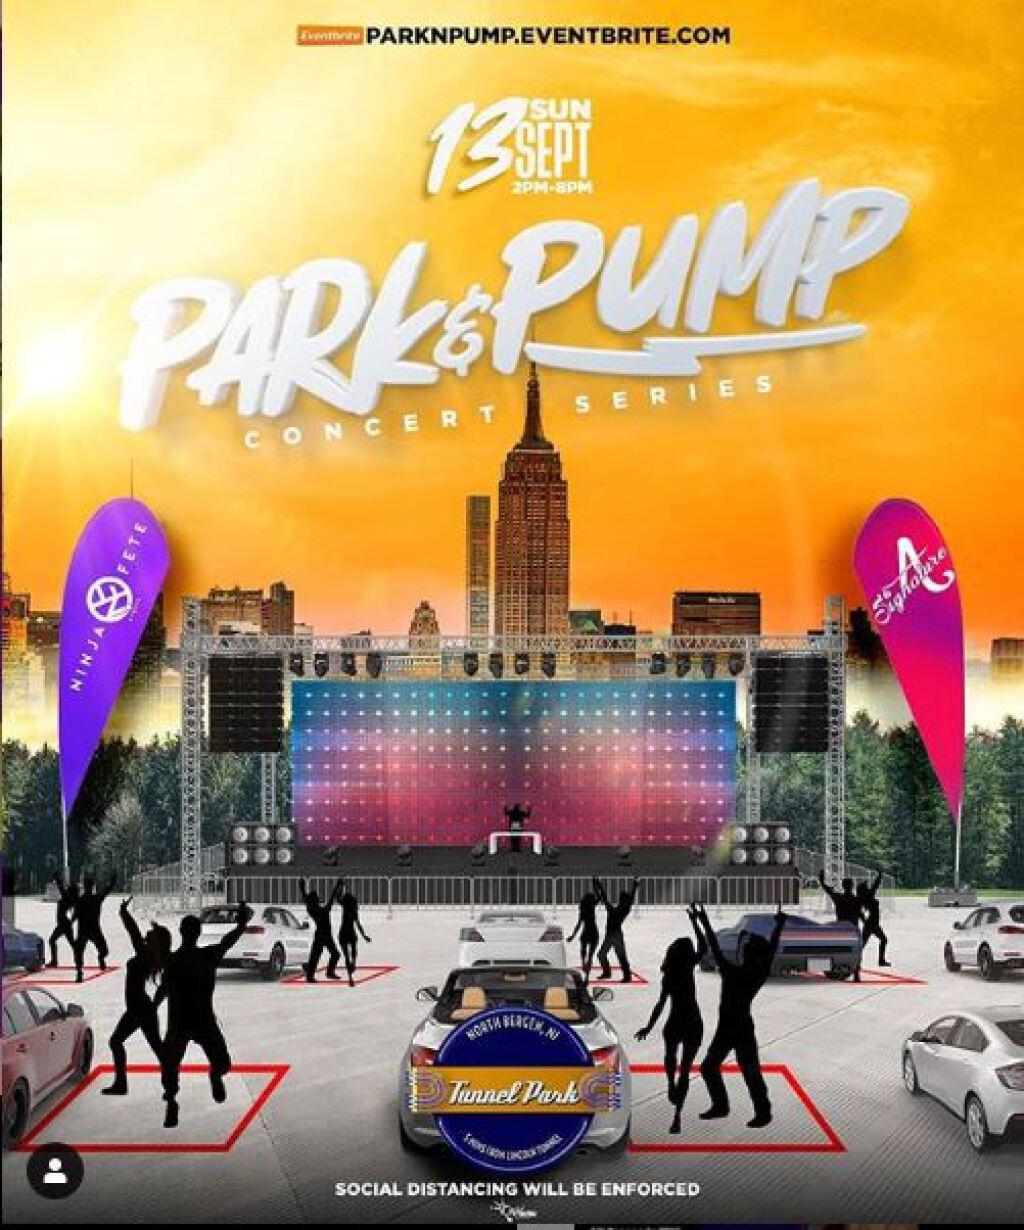 Park & Pump Concert Series flyer or graphic.